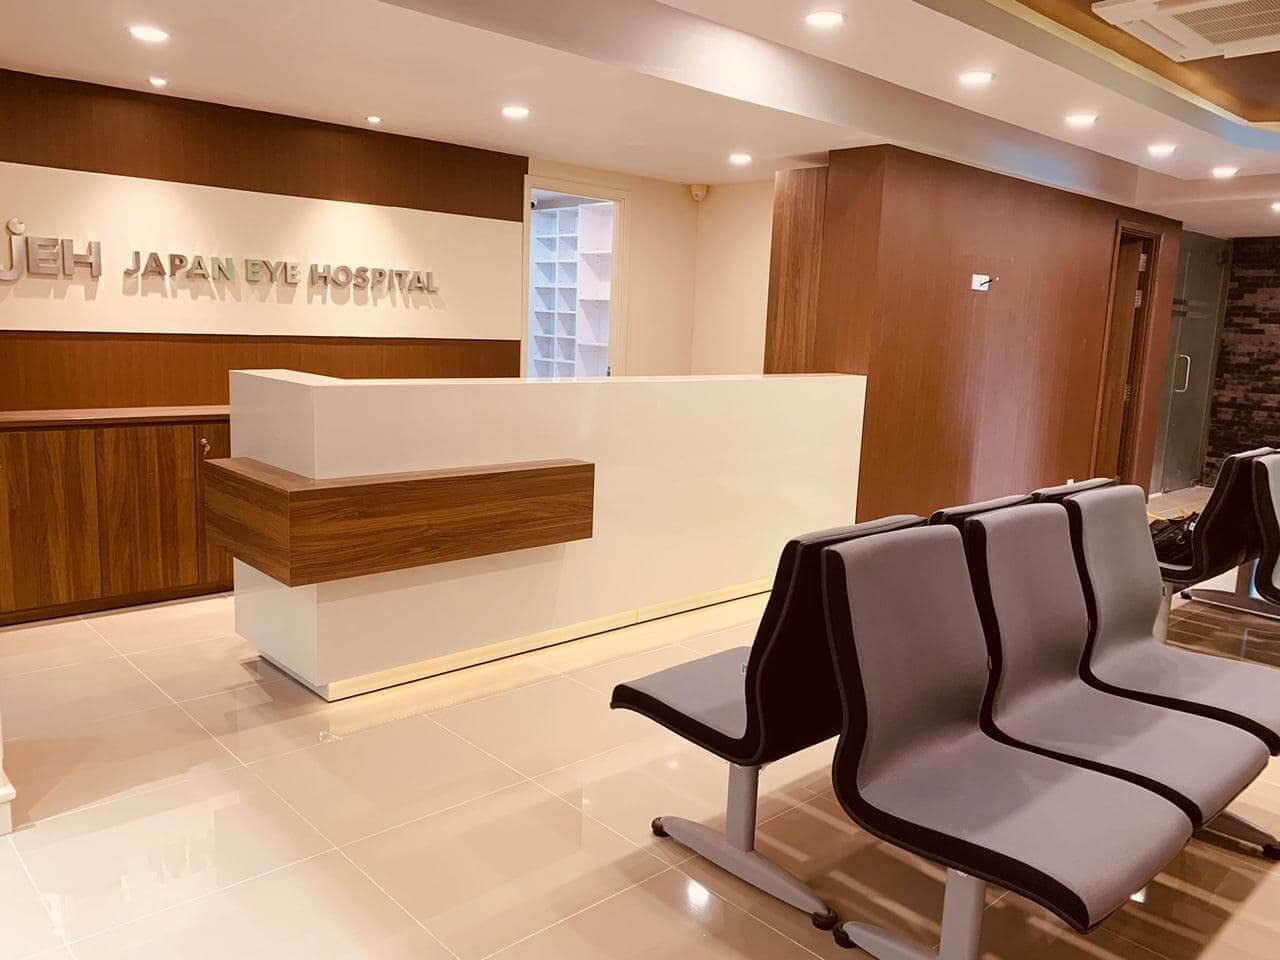 Japan Eye Hospital & パリミキ・メガネ